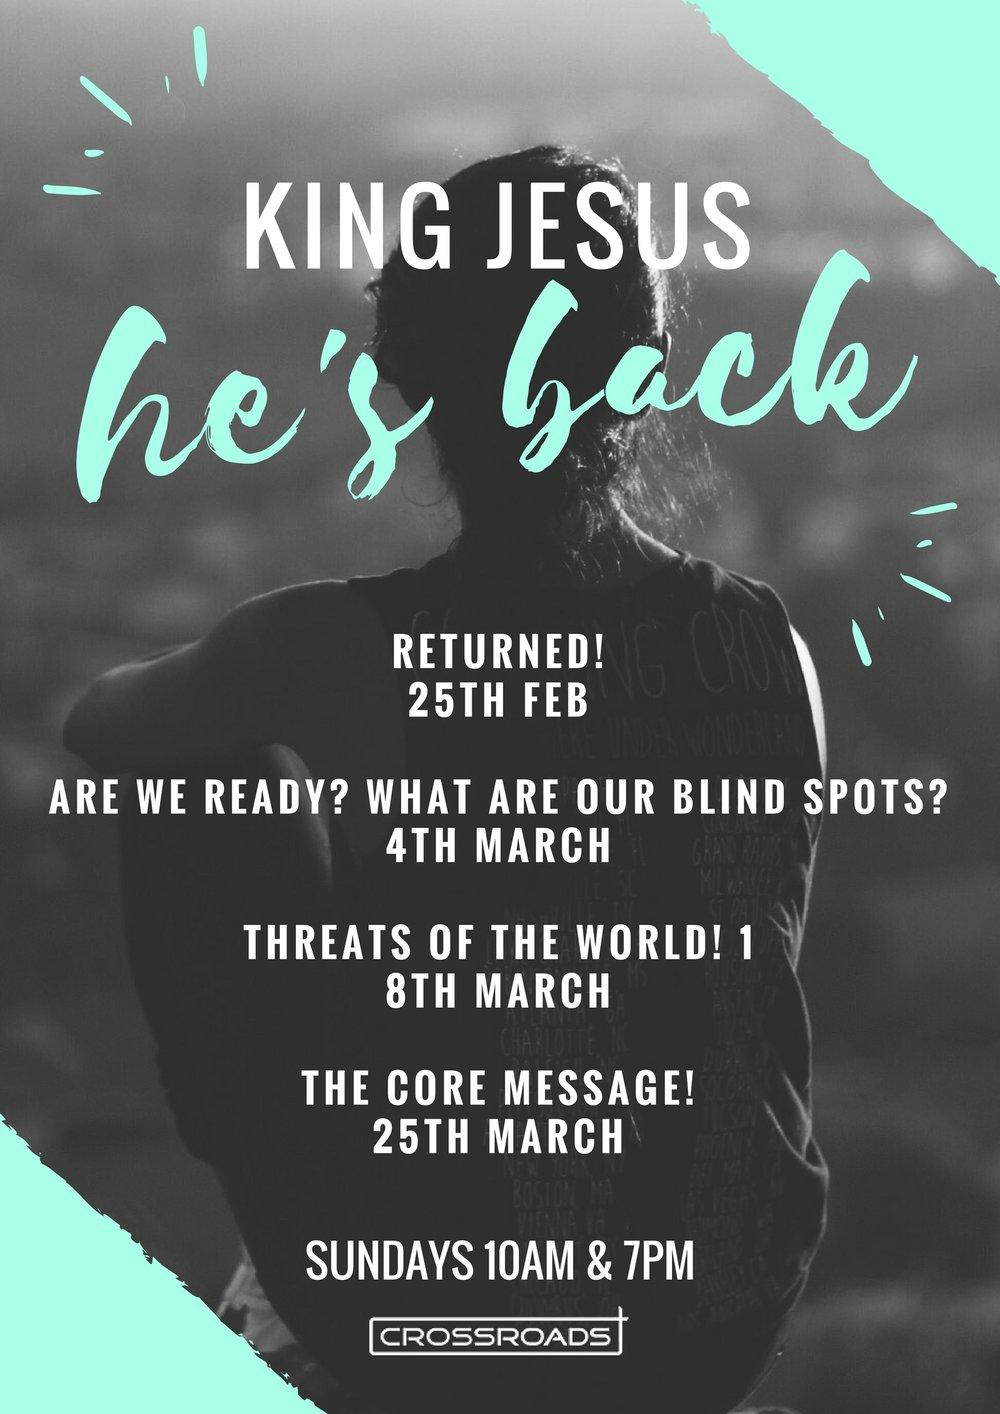 King Jesus - He's Back.jpg